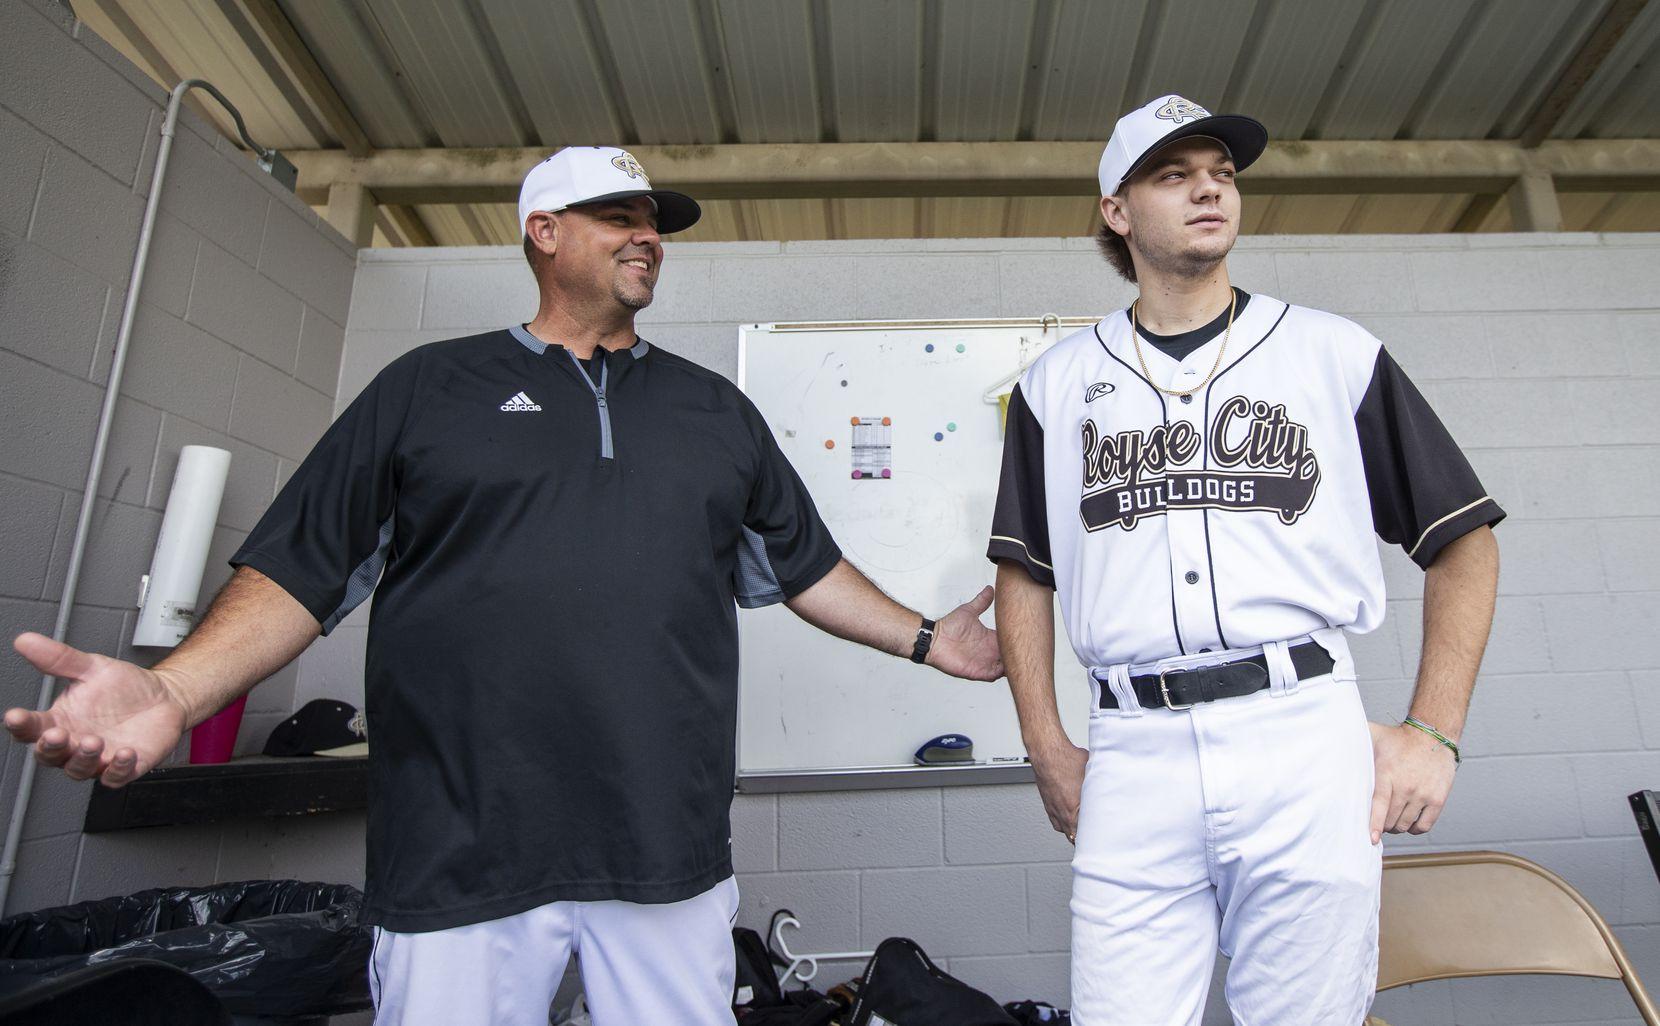 Gavin Lynch, 18, right, talks with head coach Clay Wolfe before a high school baseball game at Royse City High School, Saturday, April 24, 2021.